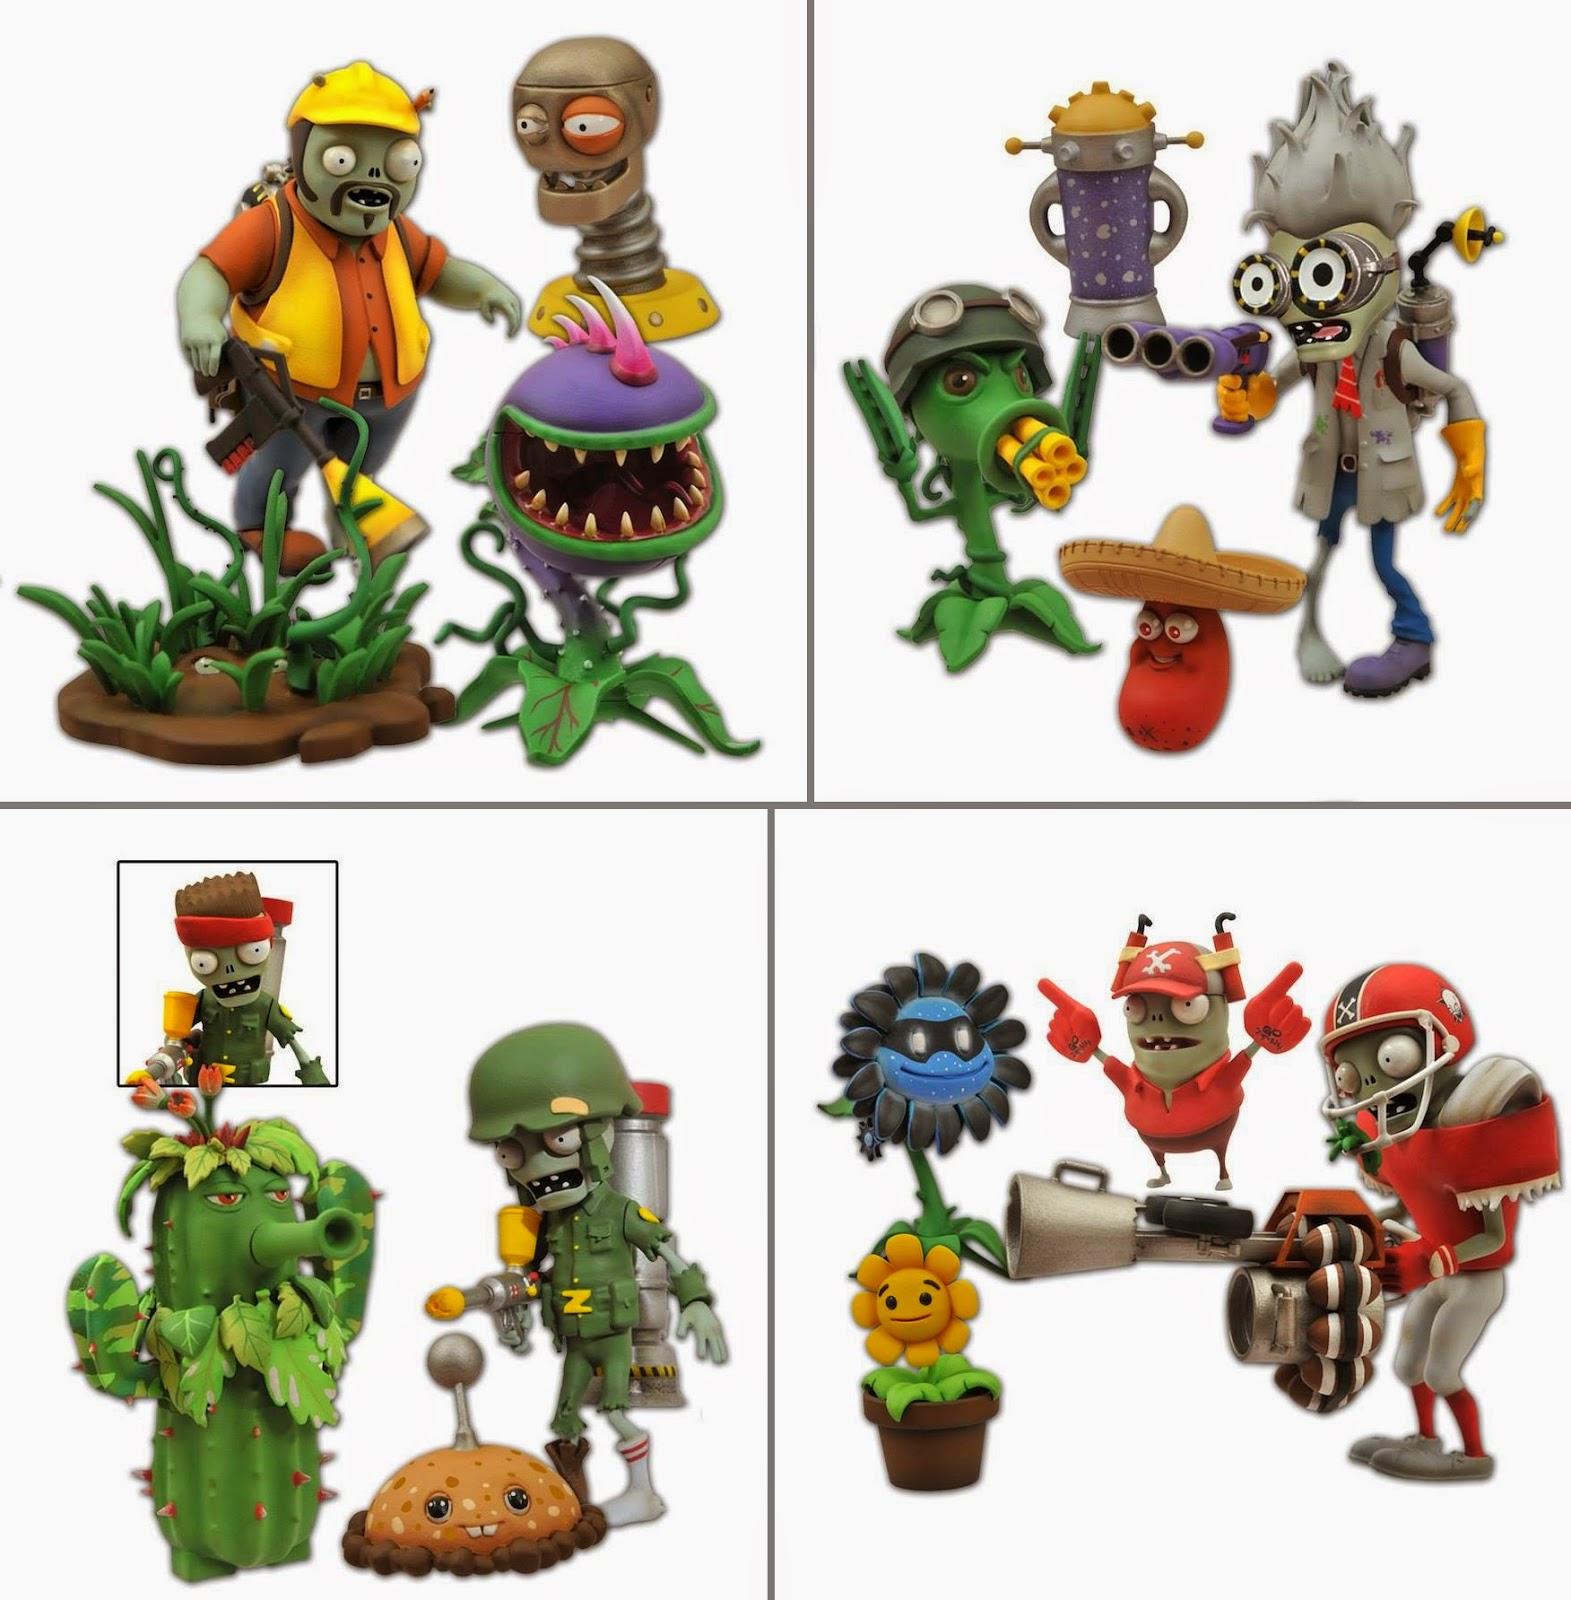 Plants Vs. Zombies: Garden Warfare action figure